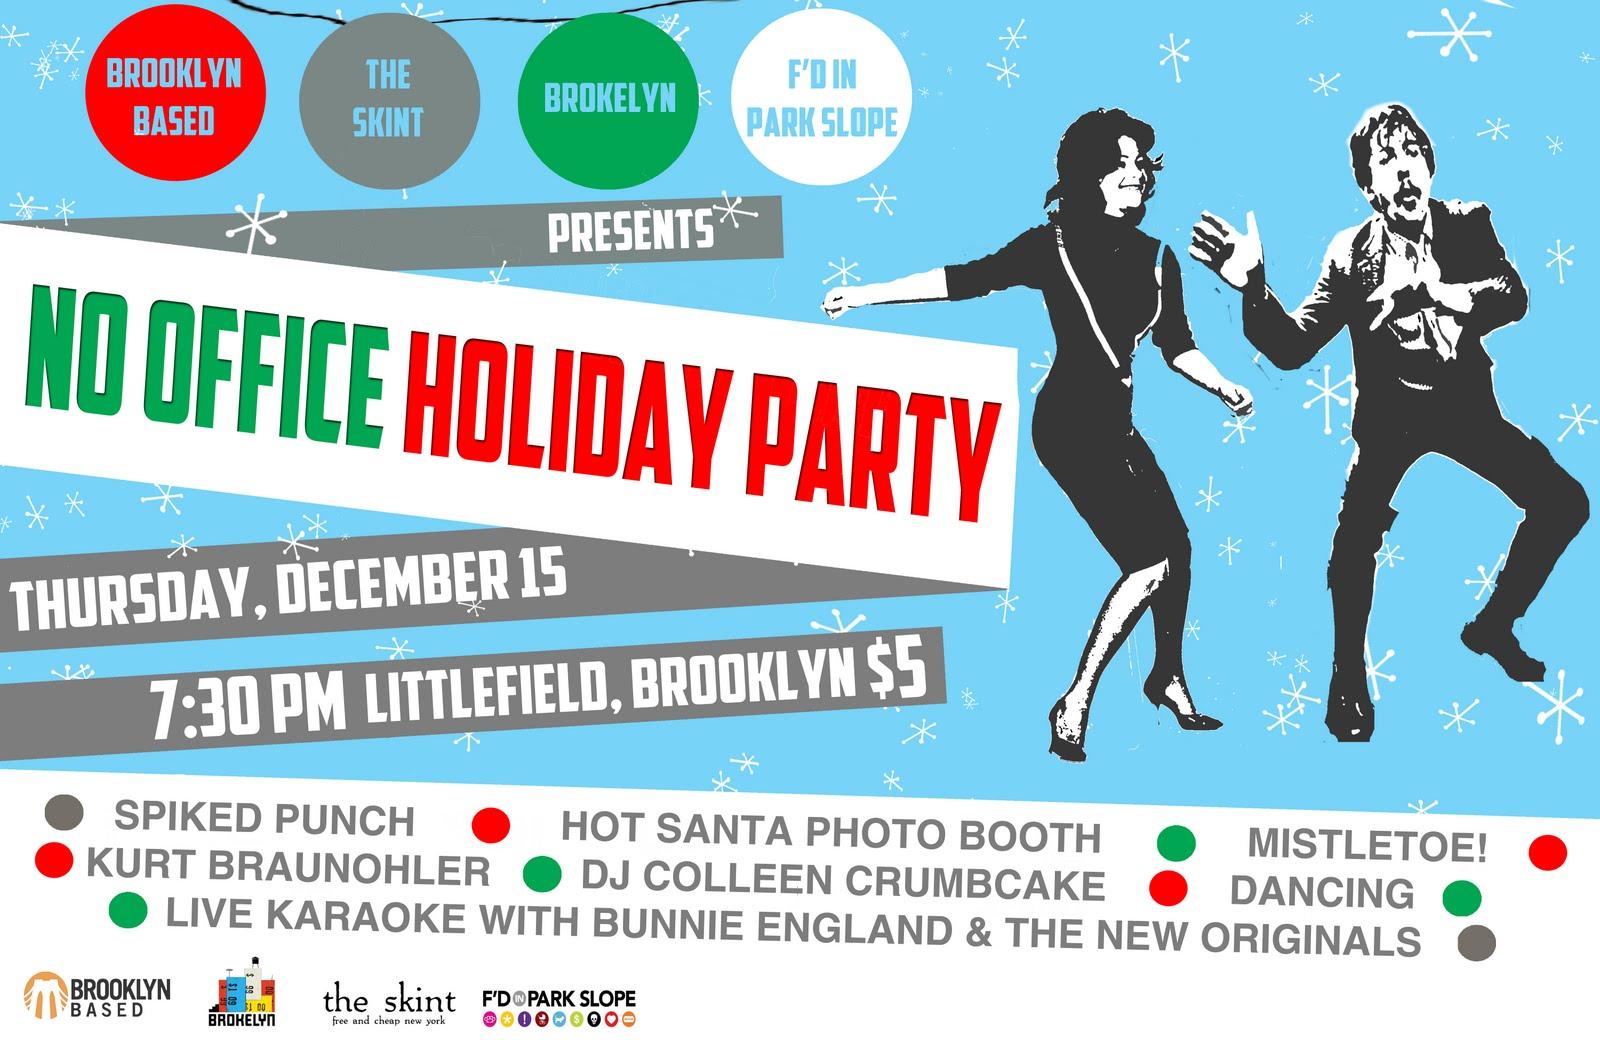 Funny Christmas Party Invitation